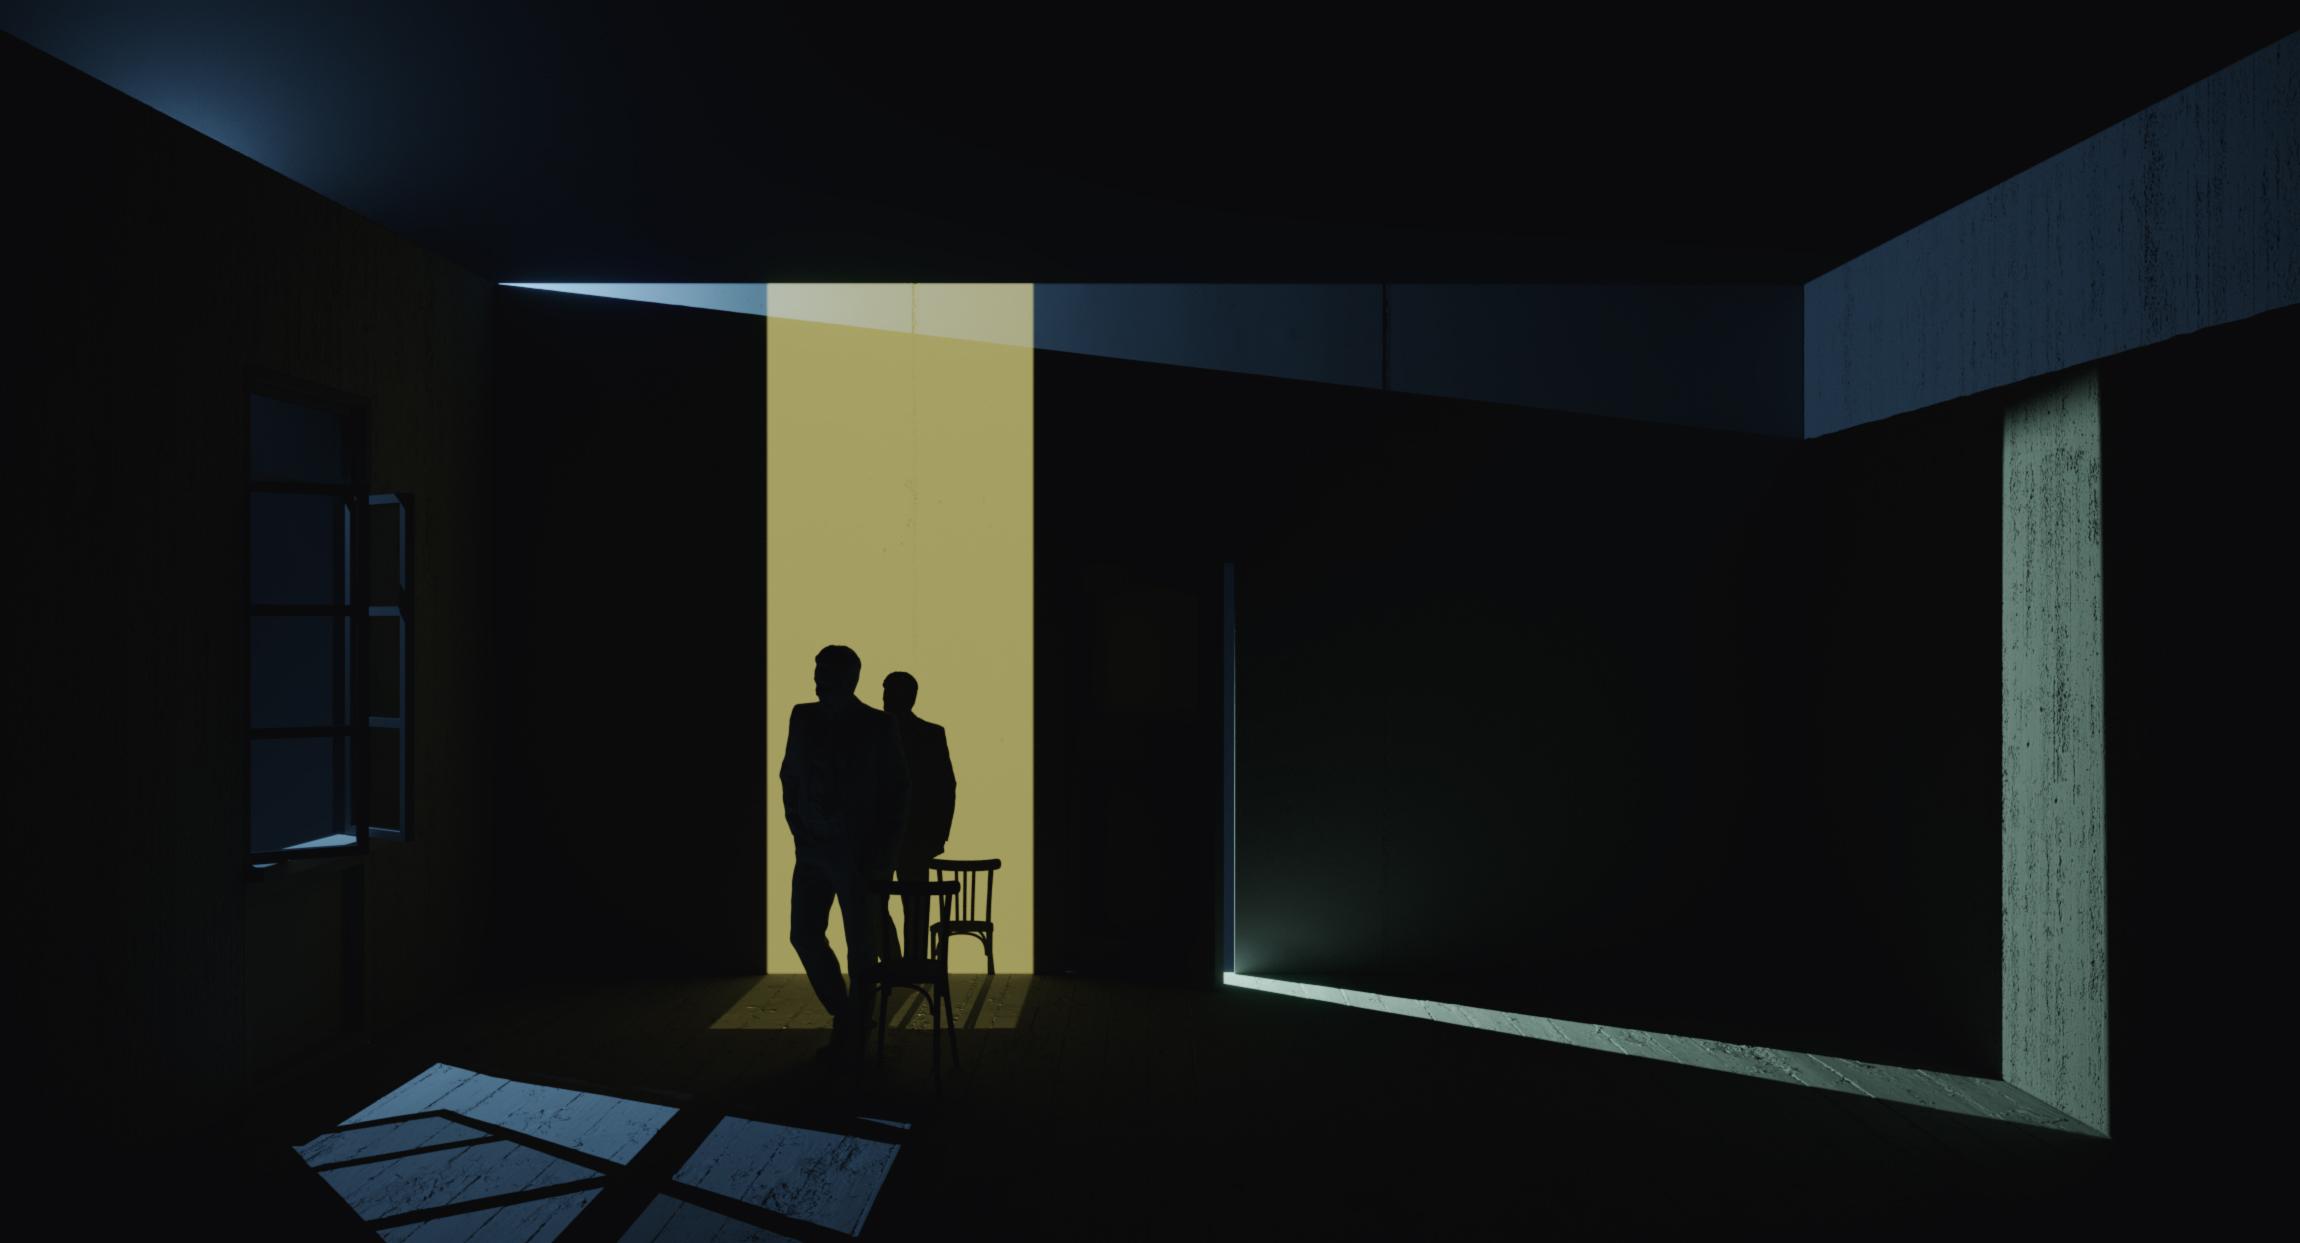 Light_Painting_Theatrical_01.jpg